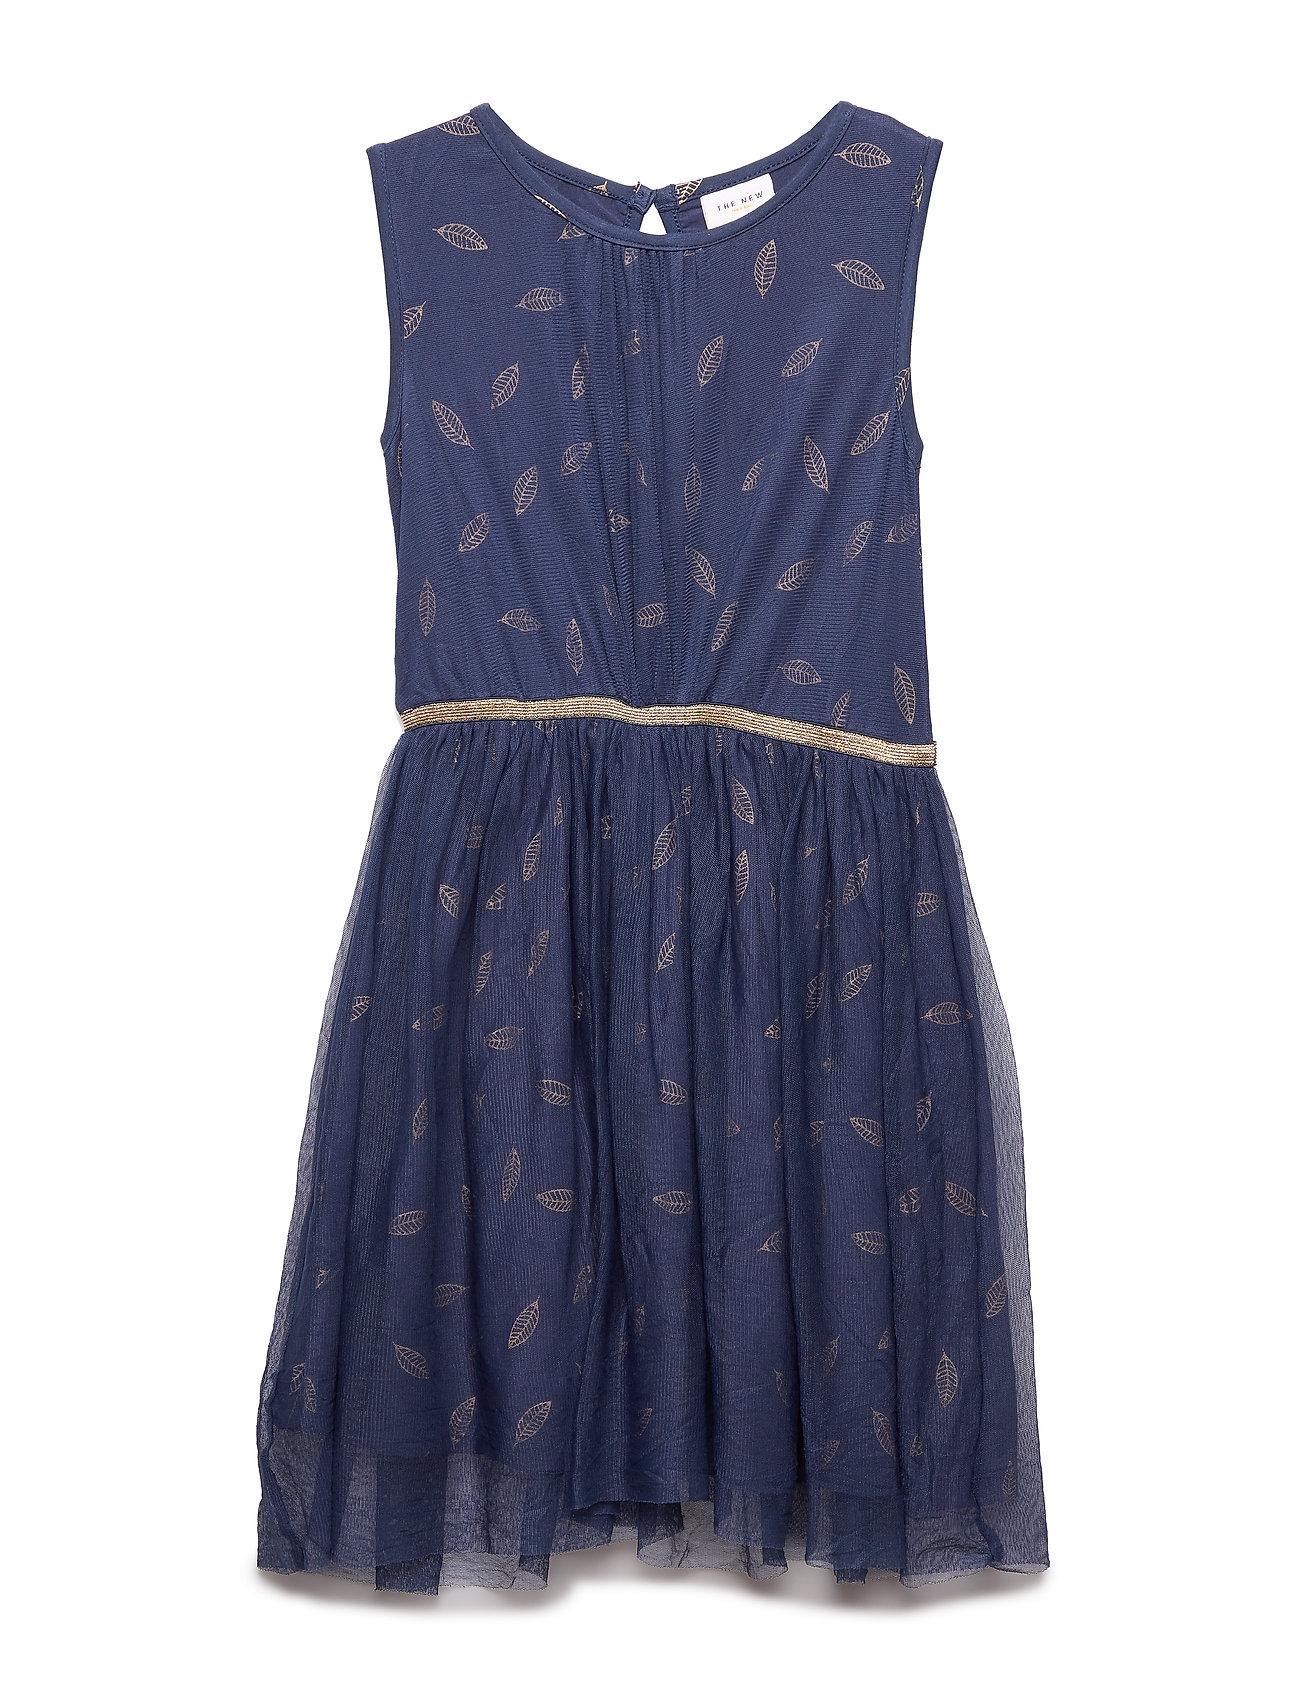 The New ANNA KRISTEL DRESS